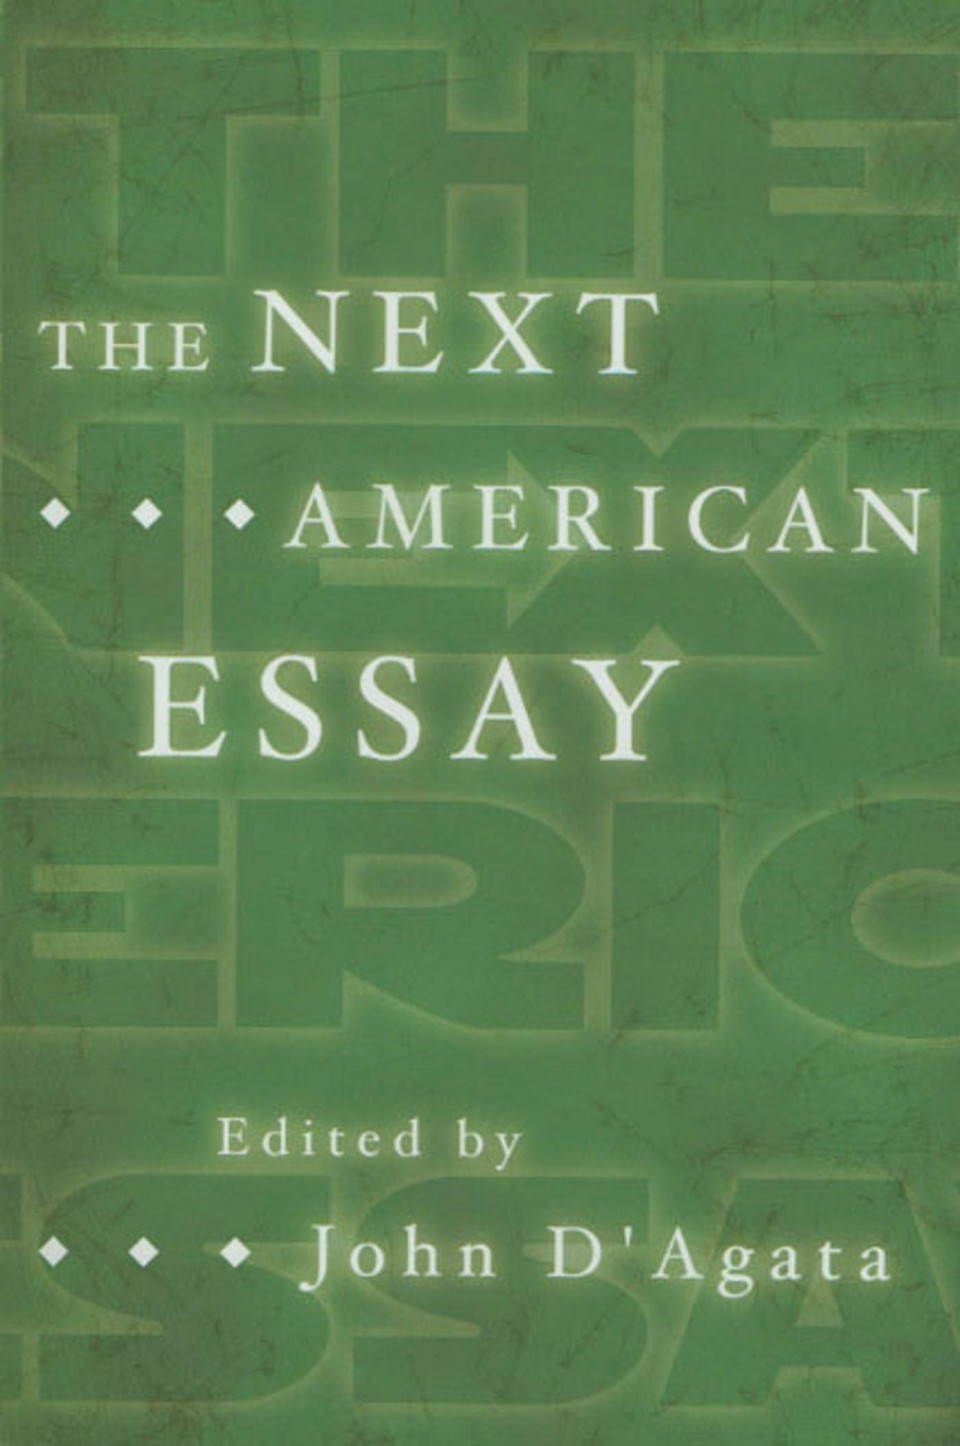 006 John Agata Essay 61uwmdqvqdl Stirring D D'agata Next American 960